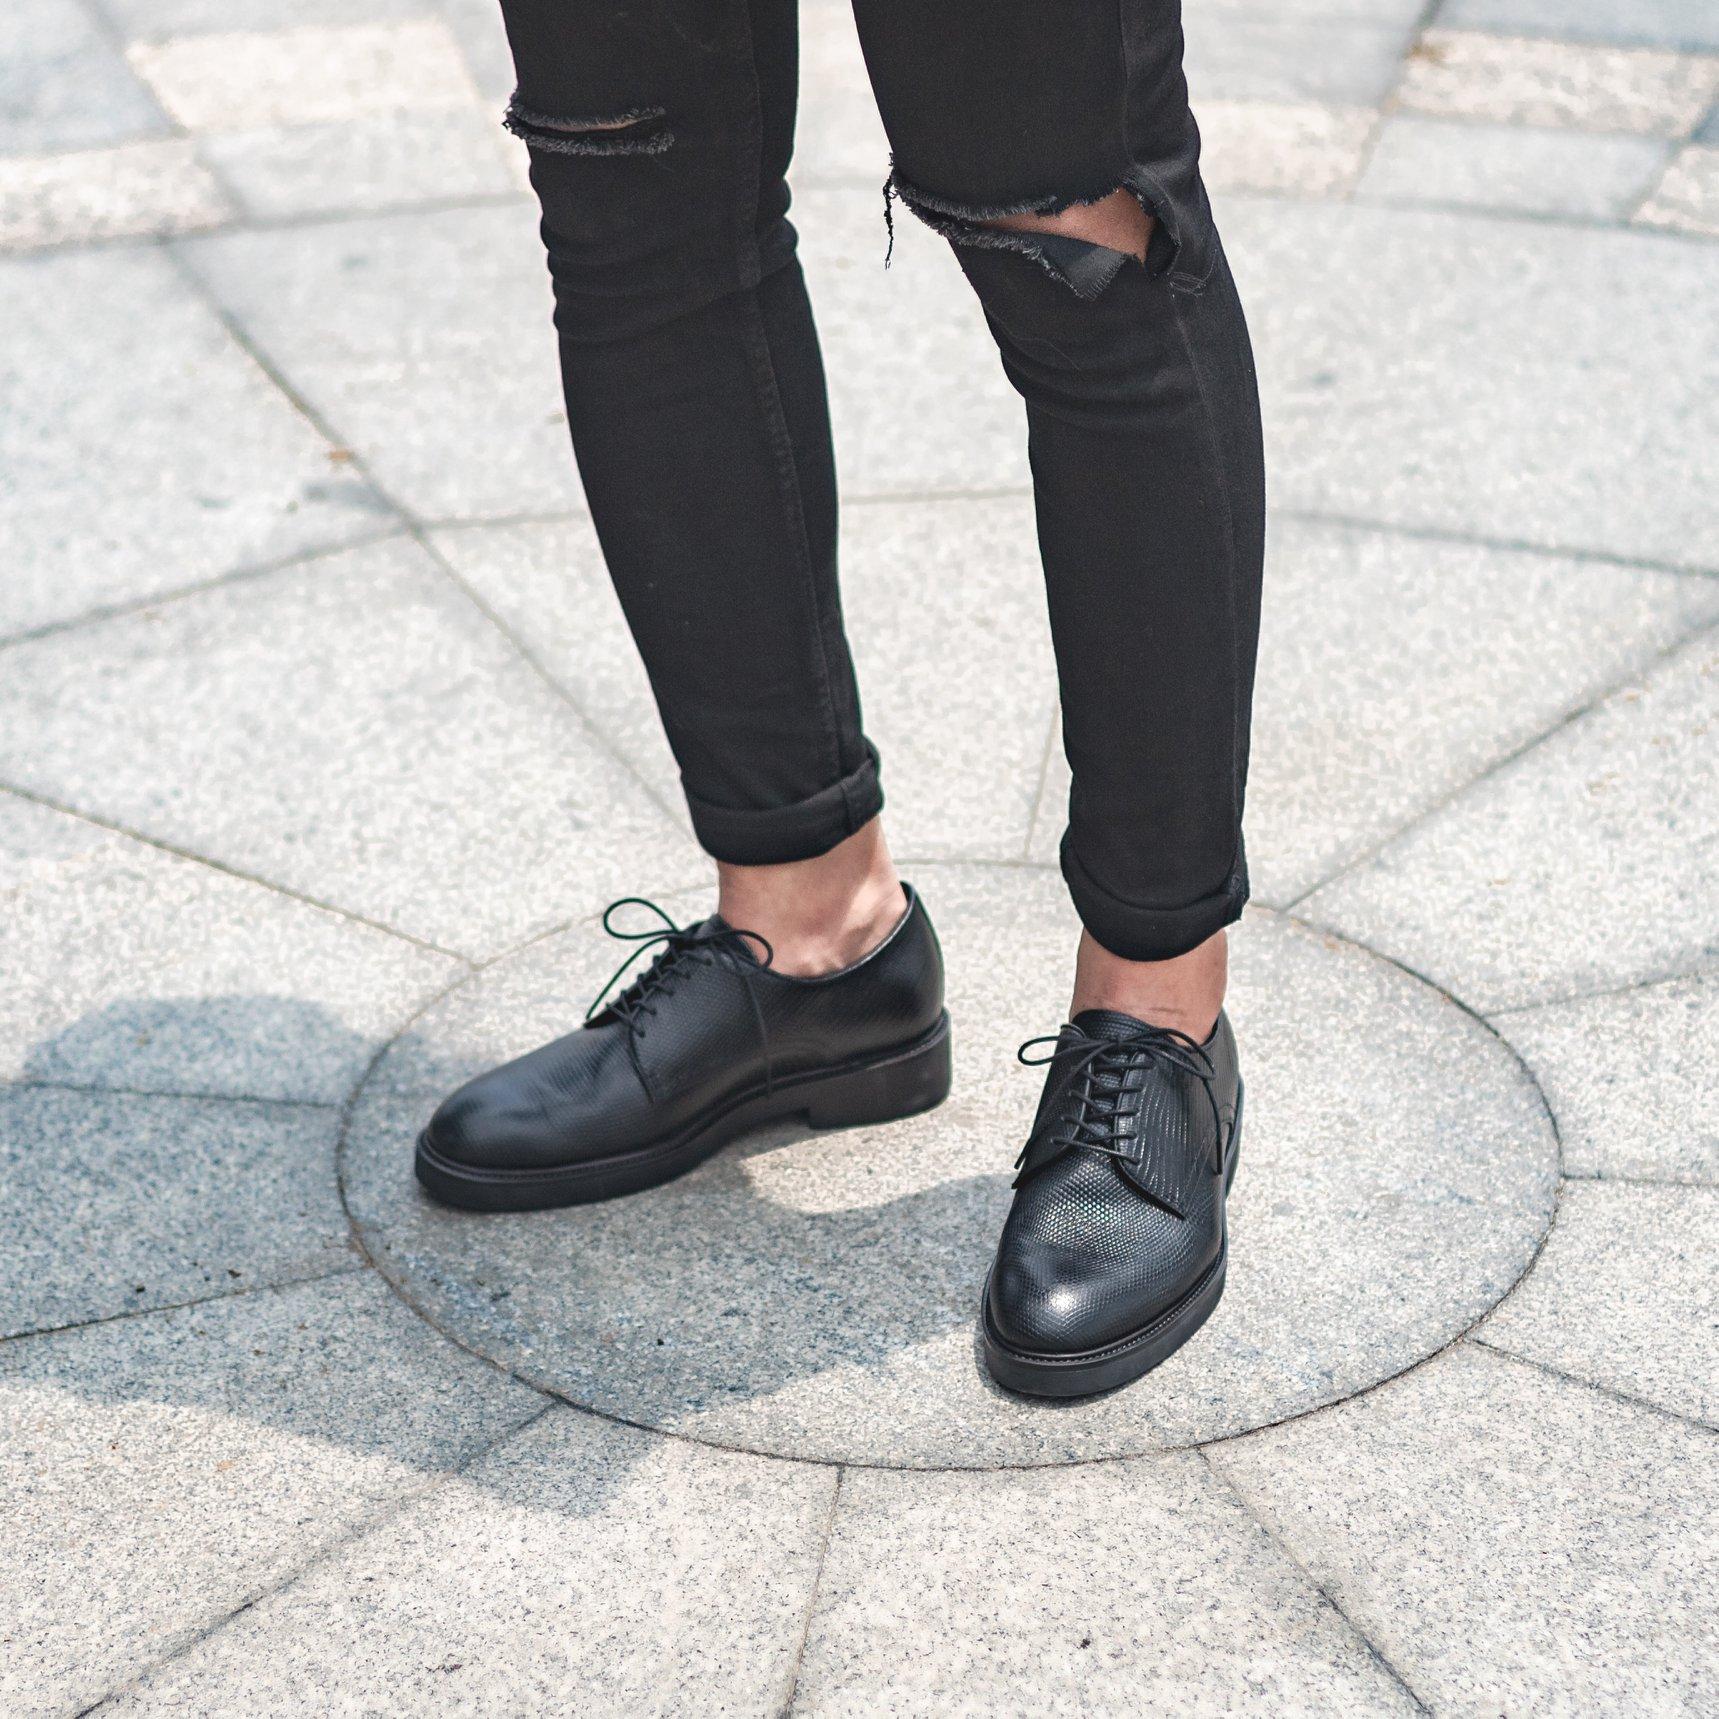 Nên mua giày Oxford hay Derby